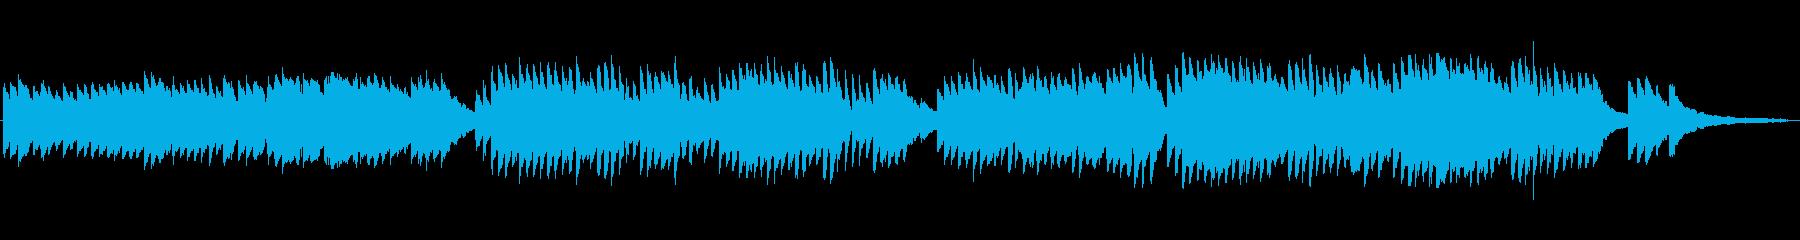 Piano Intermezzoの再生済みの波形